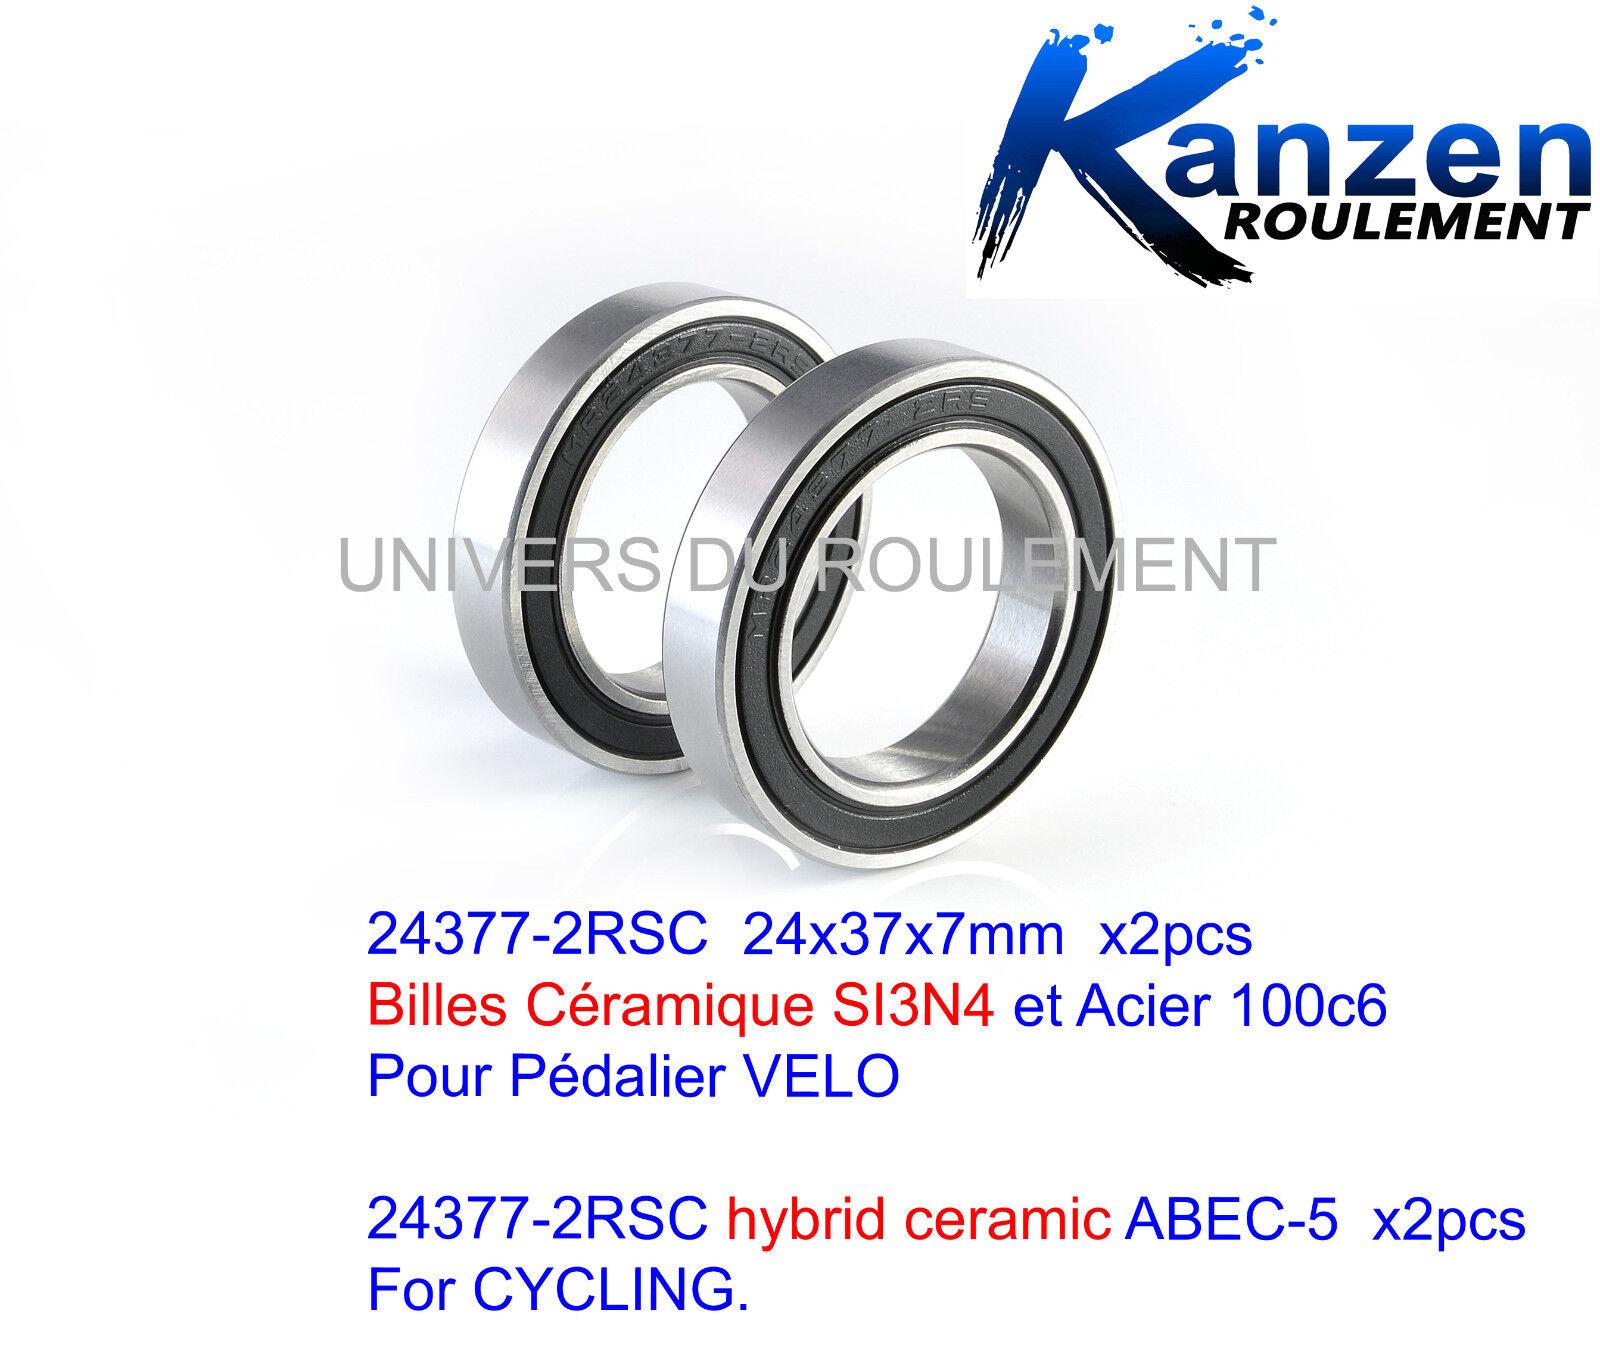 ROULEMENT A BILLES CERAMIQUE 24X37X7 24377 (2pcs) CYCLISME SRAM SHIMANO BB92